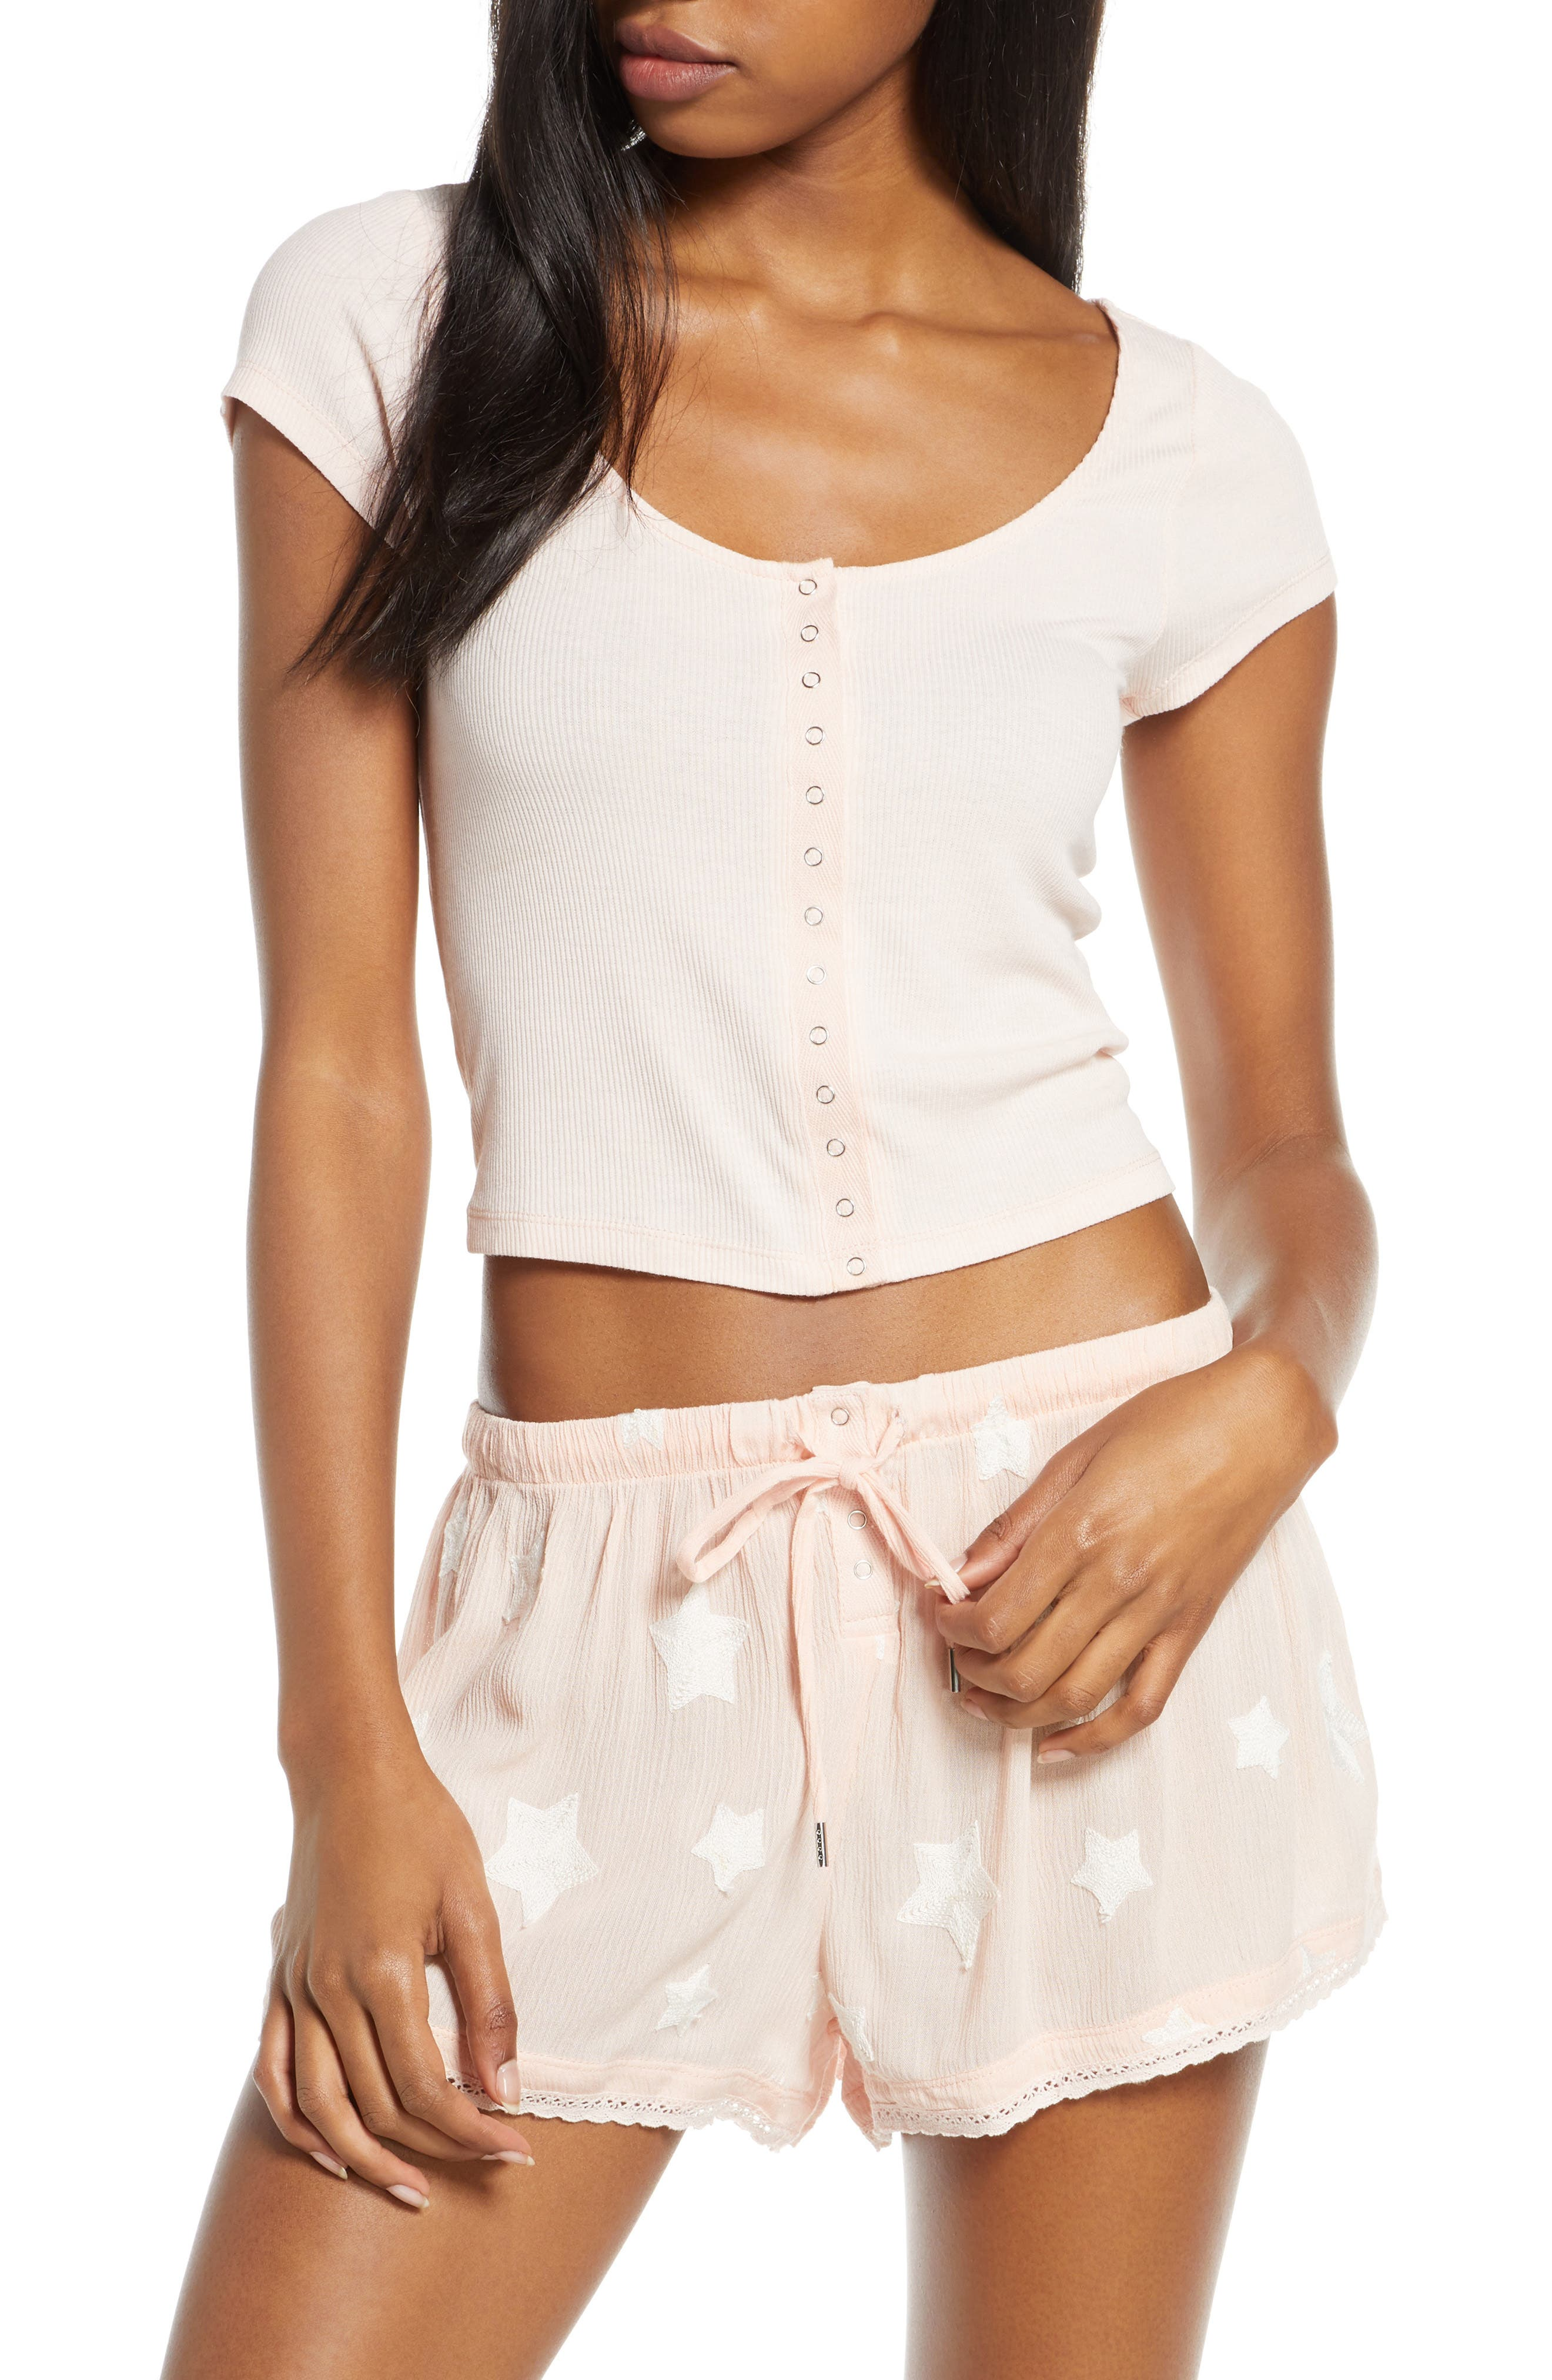 Honeydew Intimates Short Pajamas, Pink